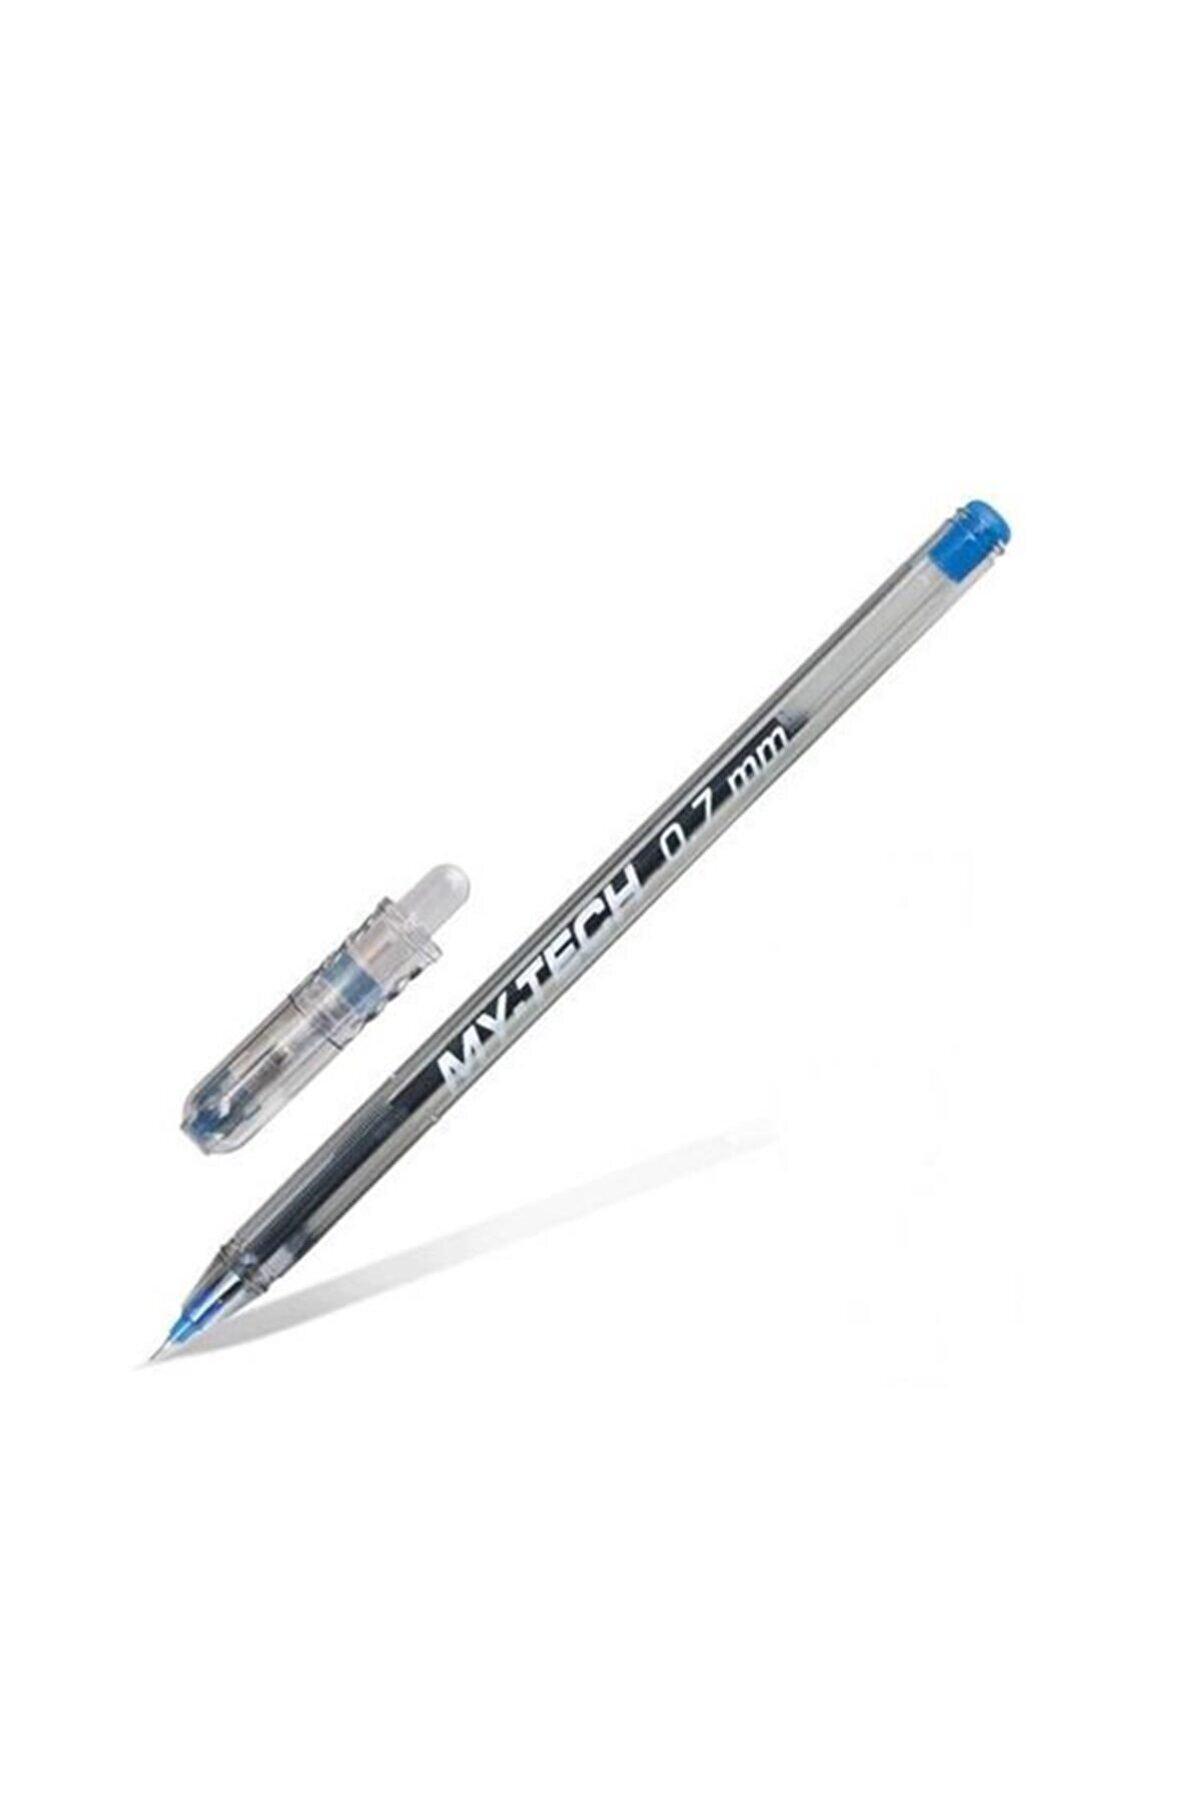 Pensan My-tech Tükenmez Kalem 0.7mm Mavi Pe2240ma